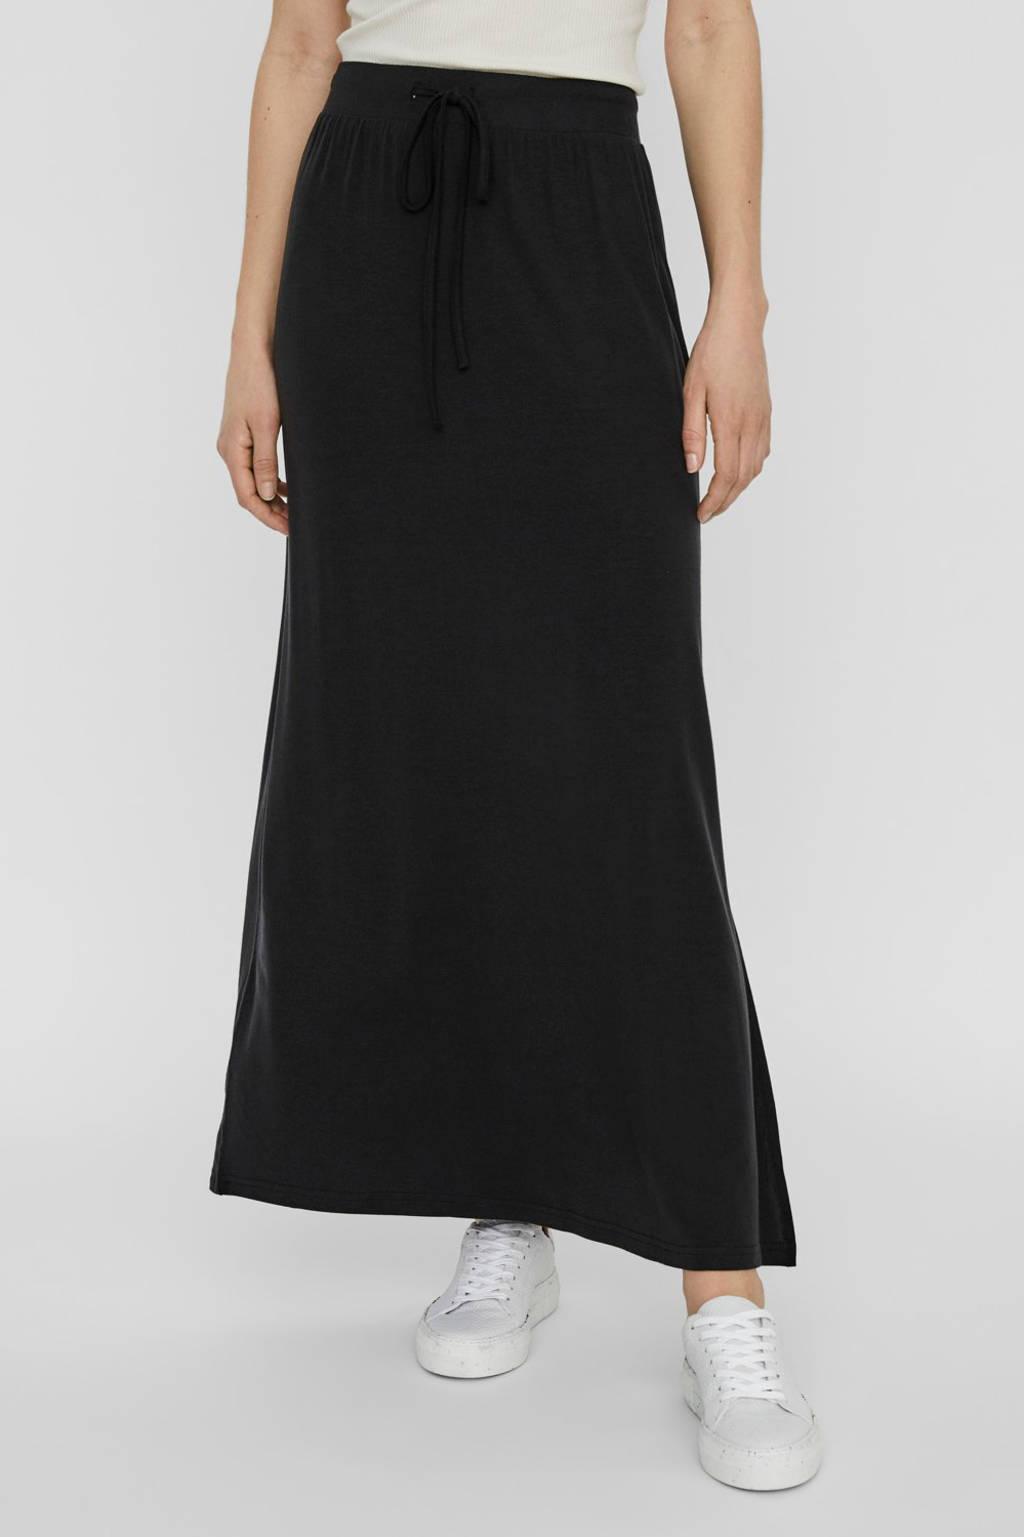 VERO MODA rok zwart, Zwart